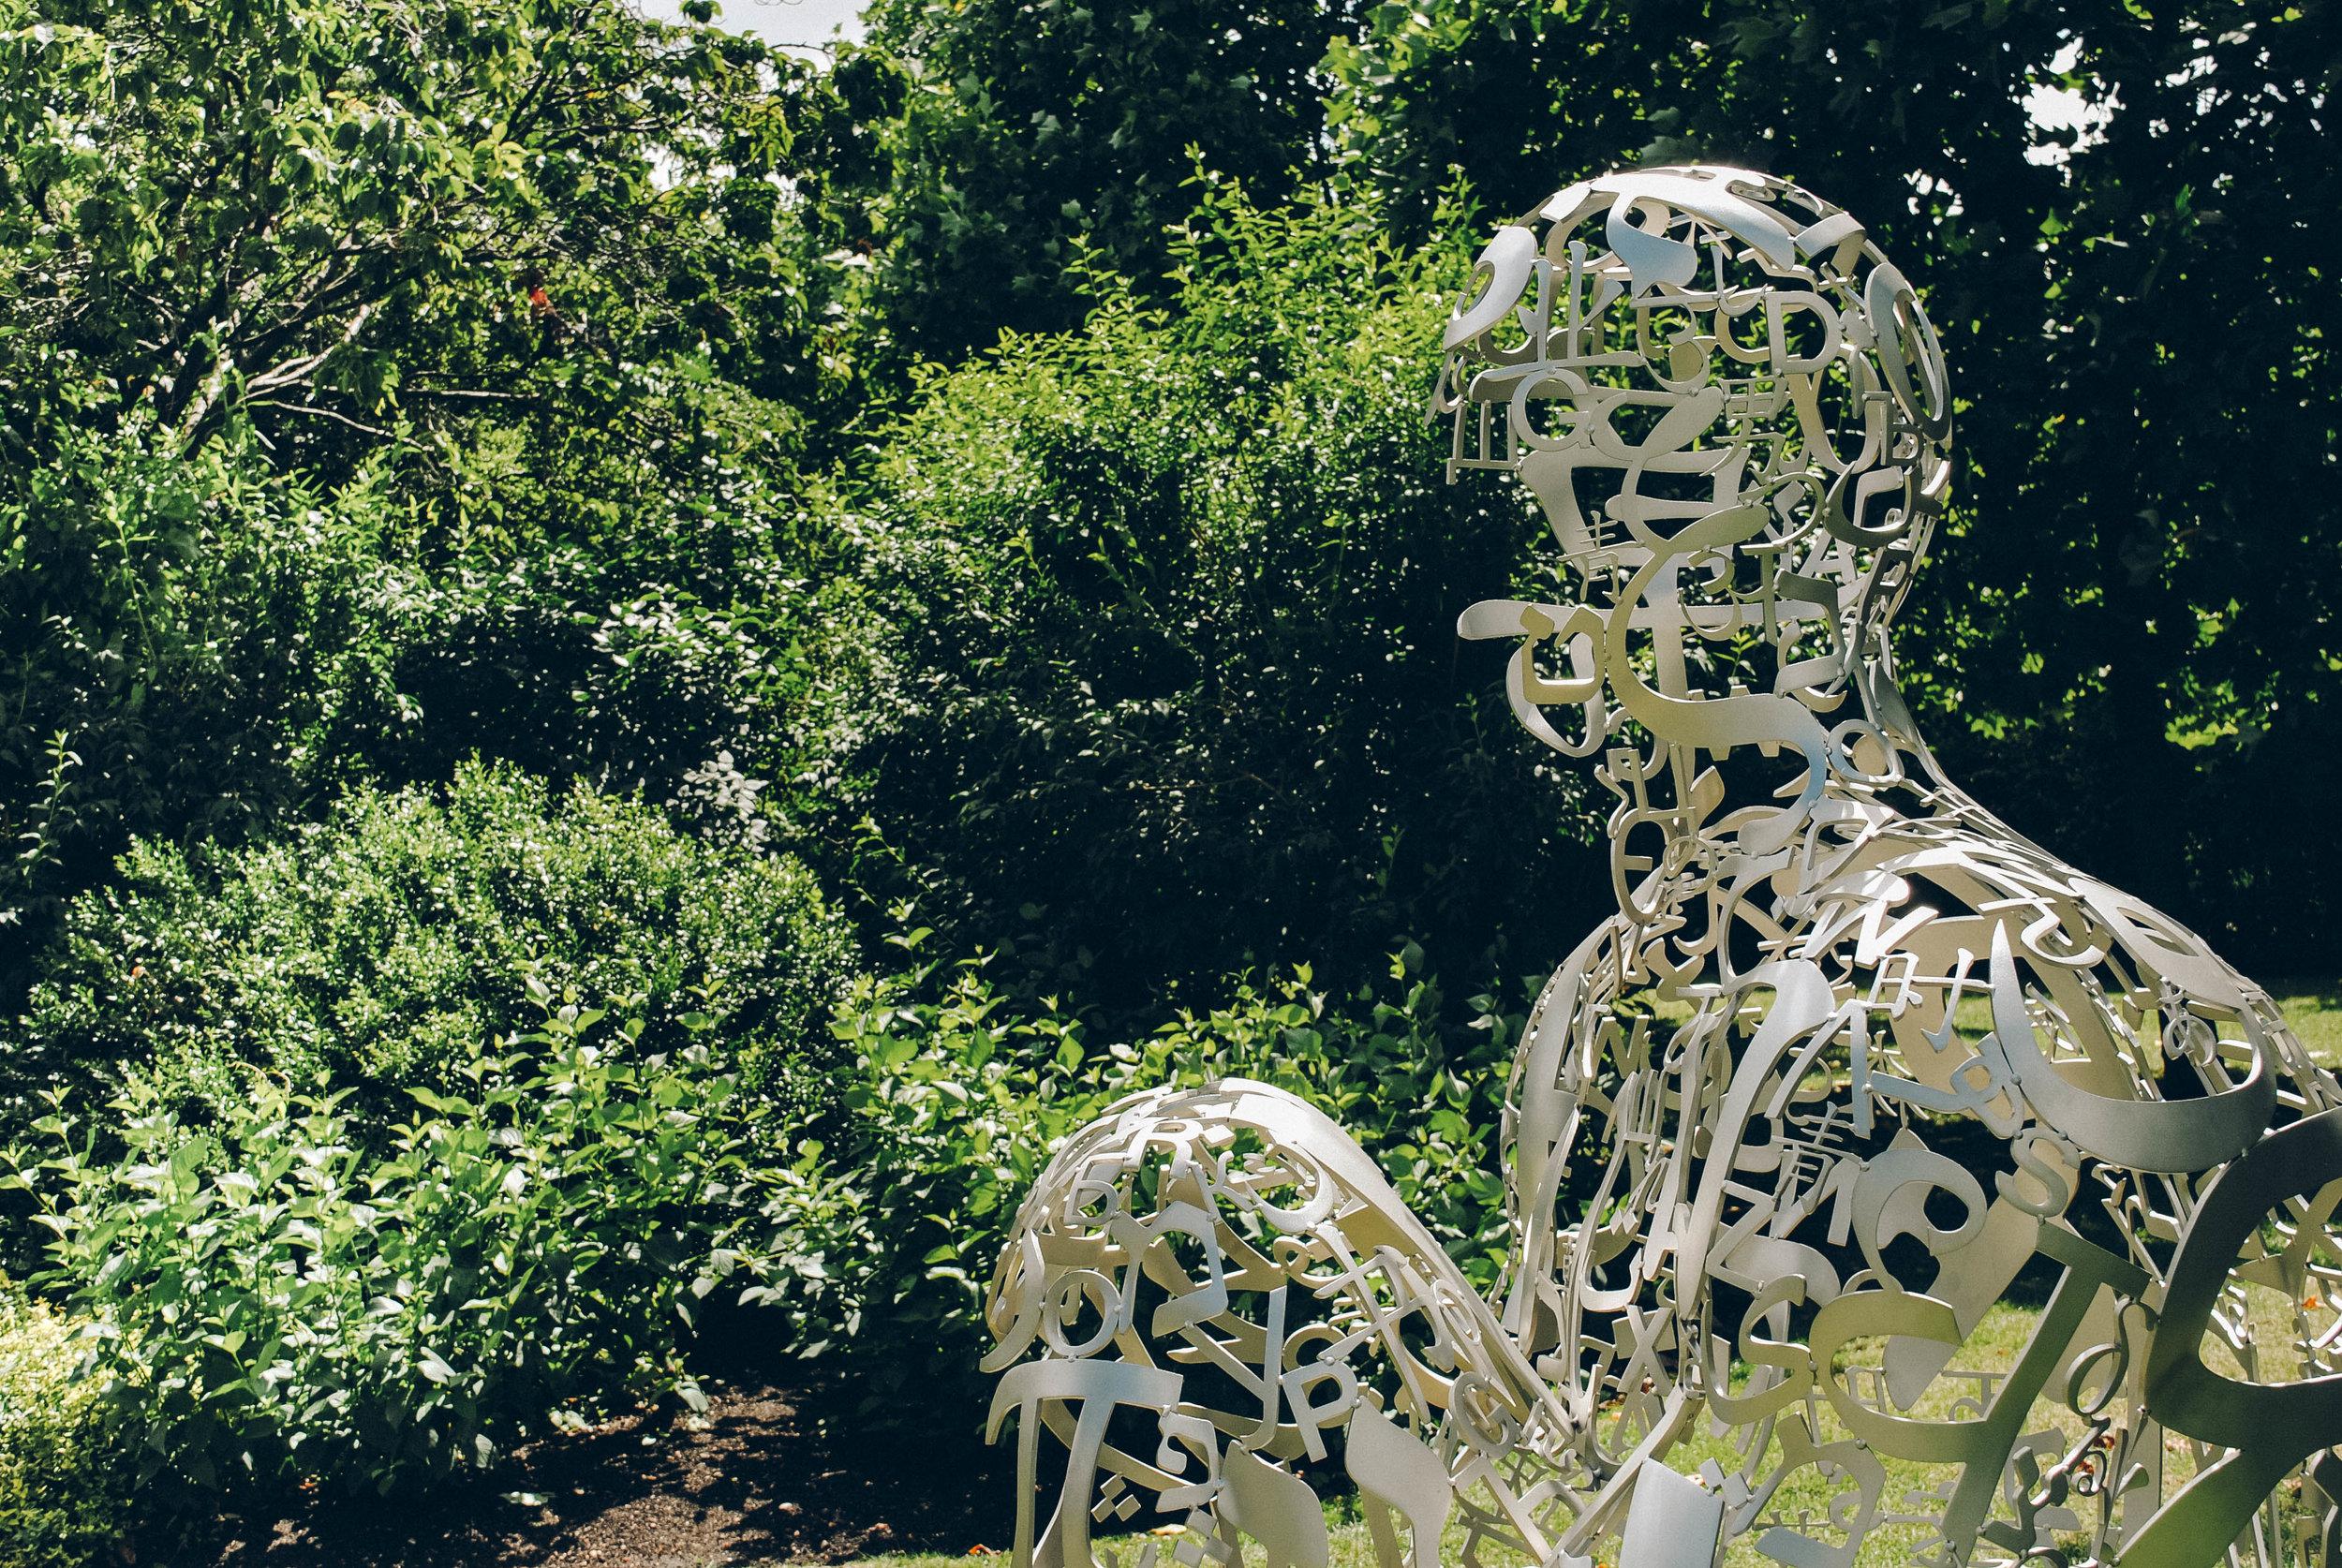 frieze sculpture regents park (15 of 15).jpg